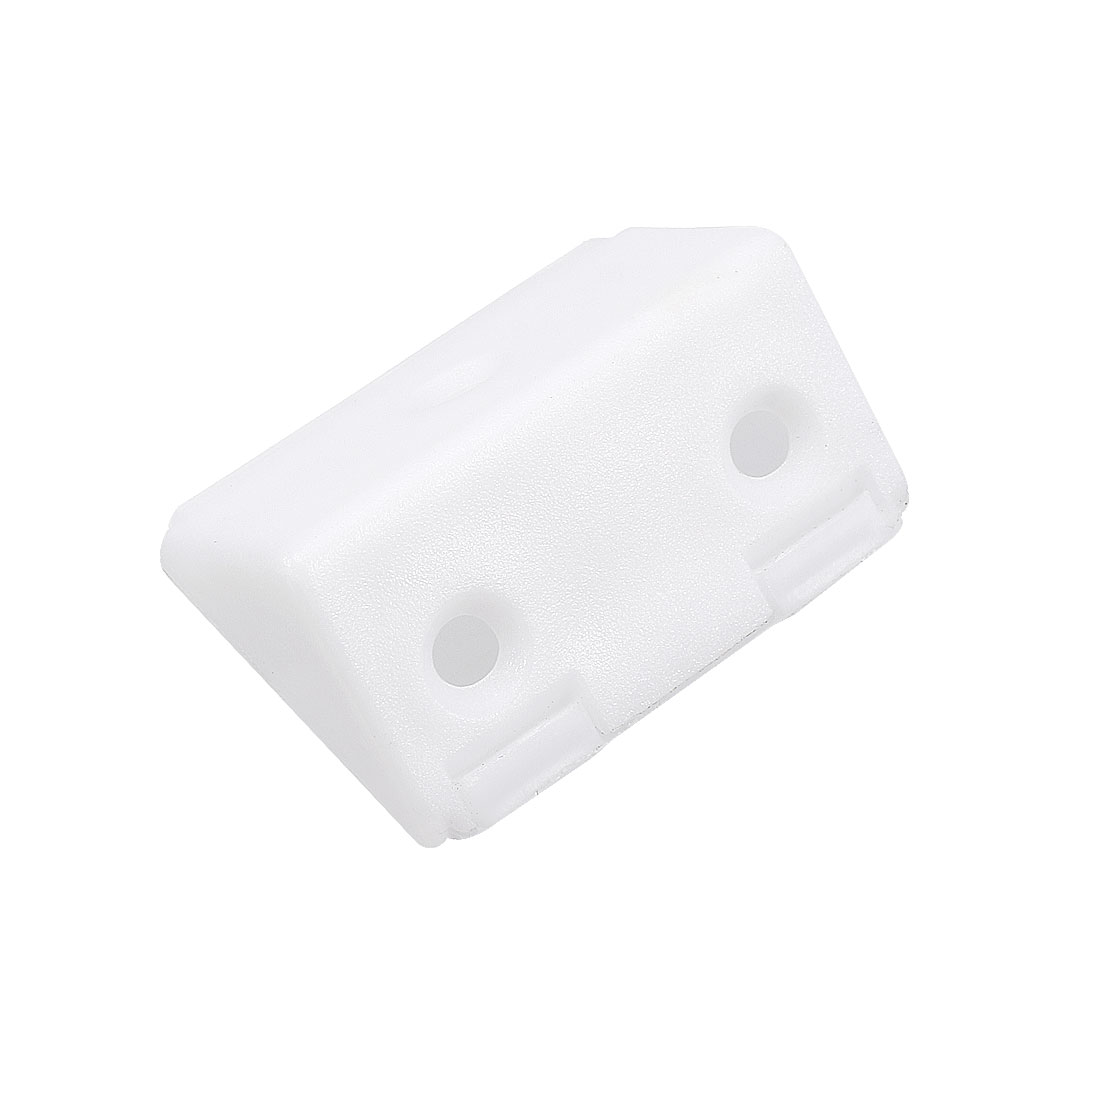 Shelf Cabinet Plastic Corner Braces 3 Holes Angle Brackets w Cover Cap, 24 Pcs